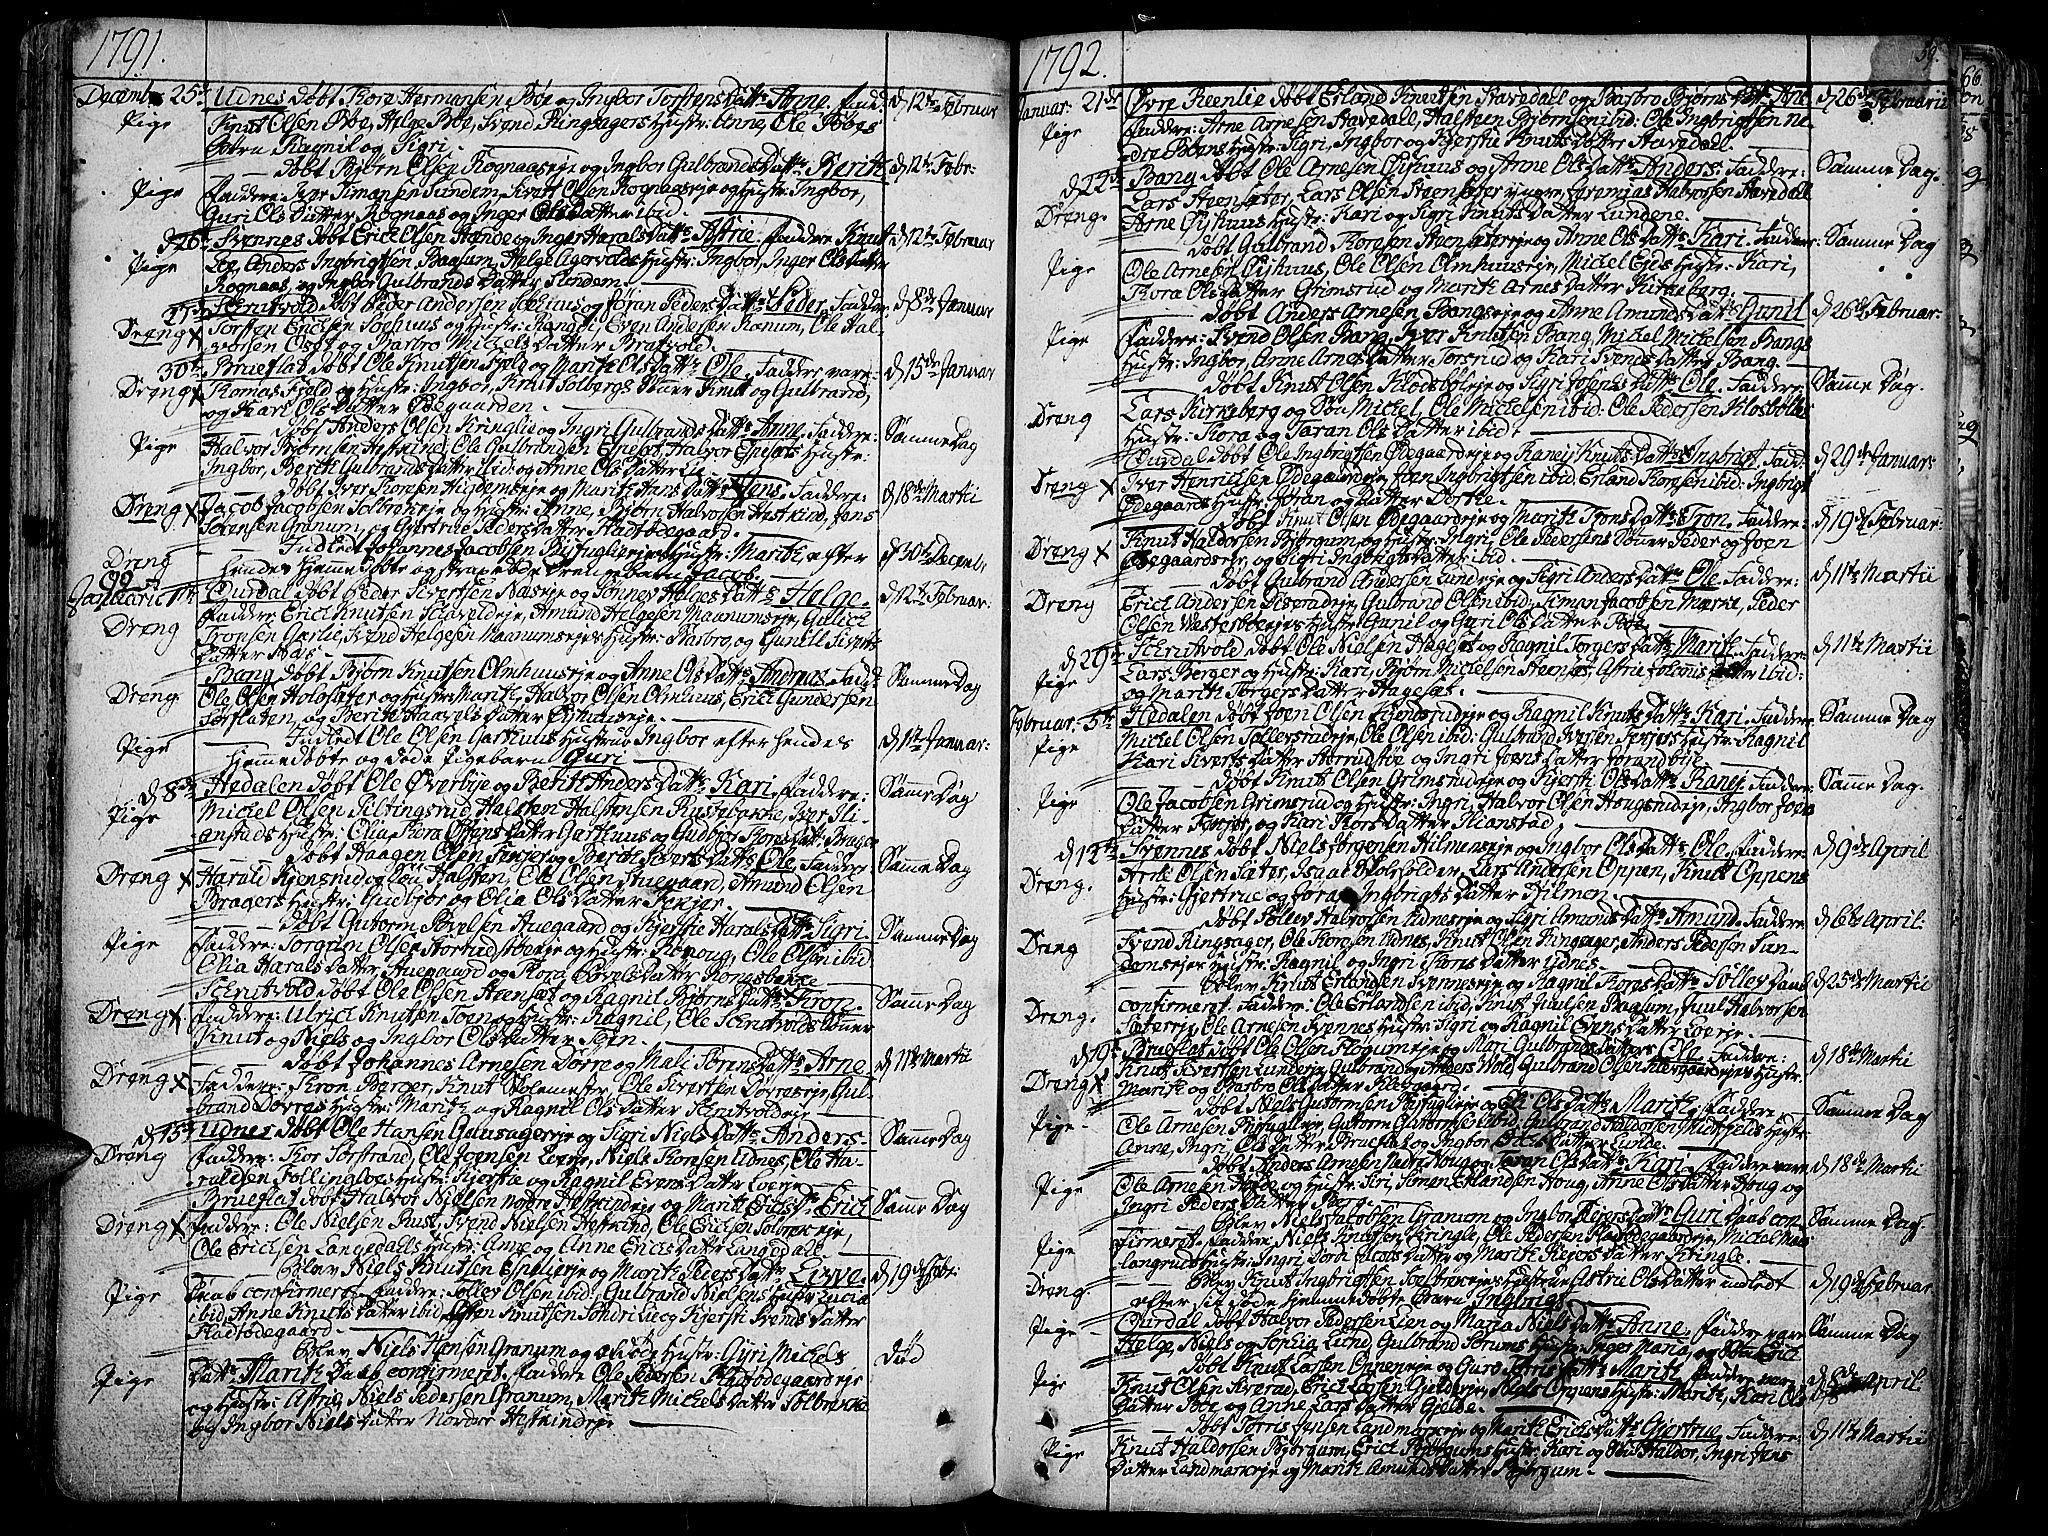 SAH, Aurdal prestekontor, Ministerialbok nr. 6, 1781-1804, s. 59